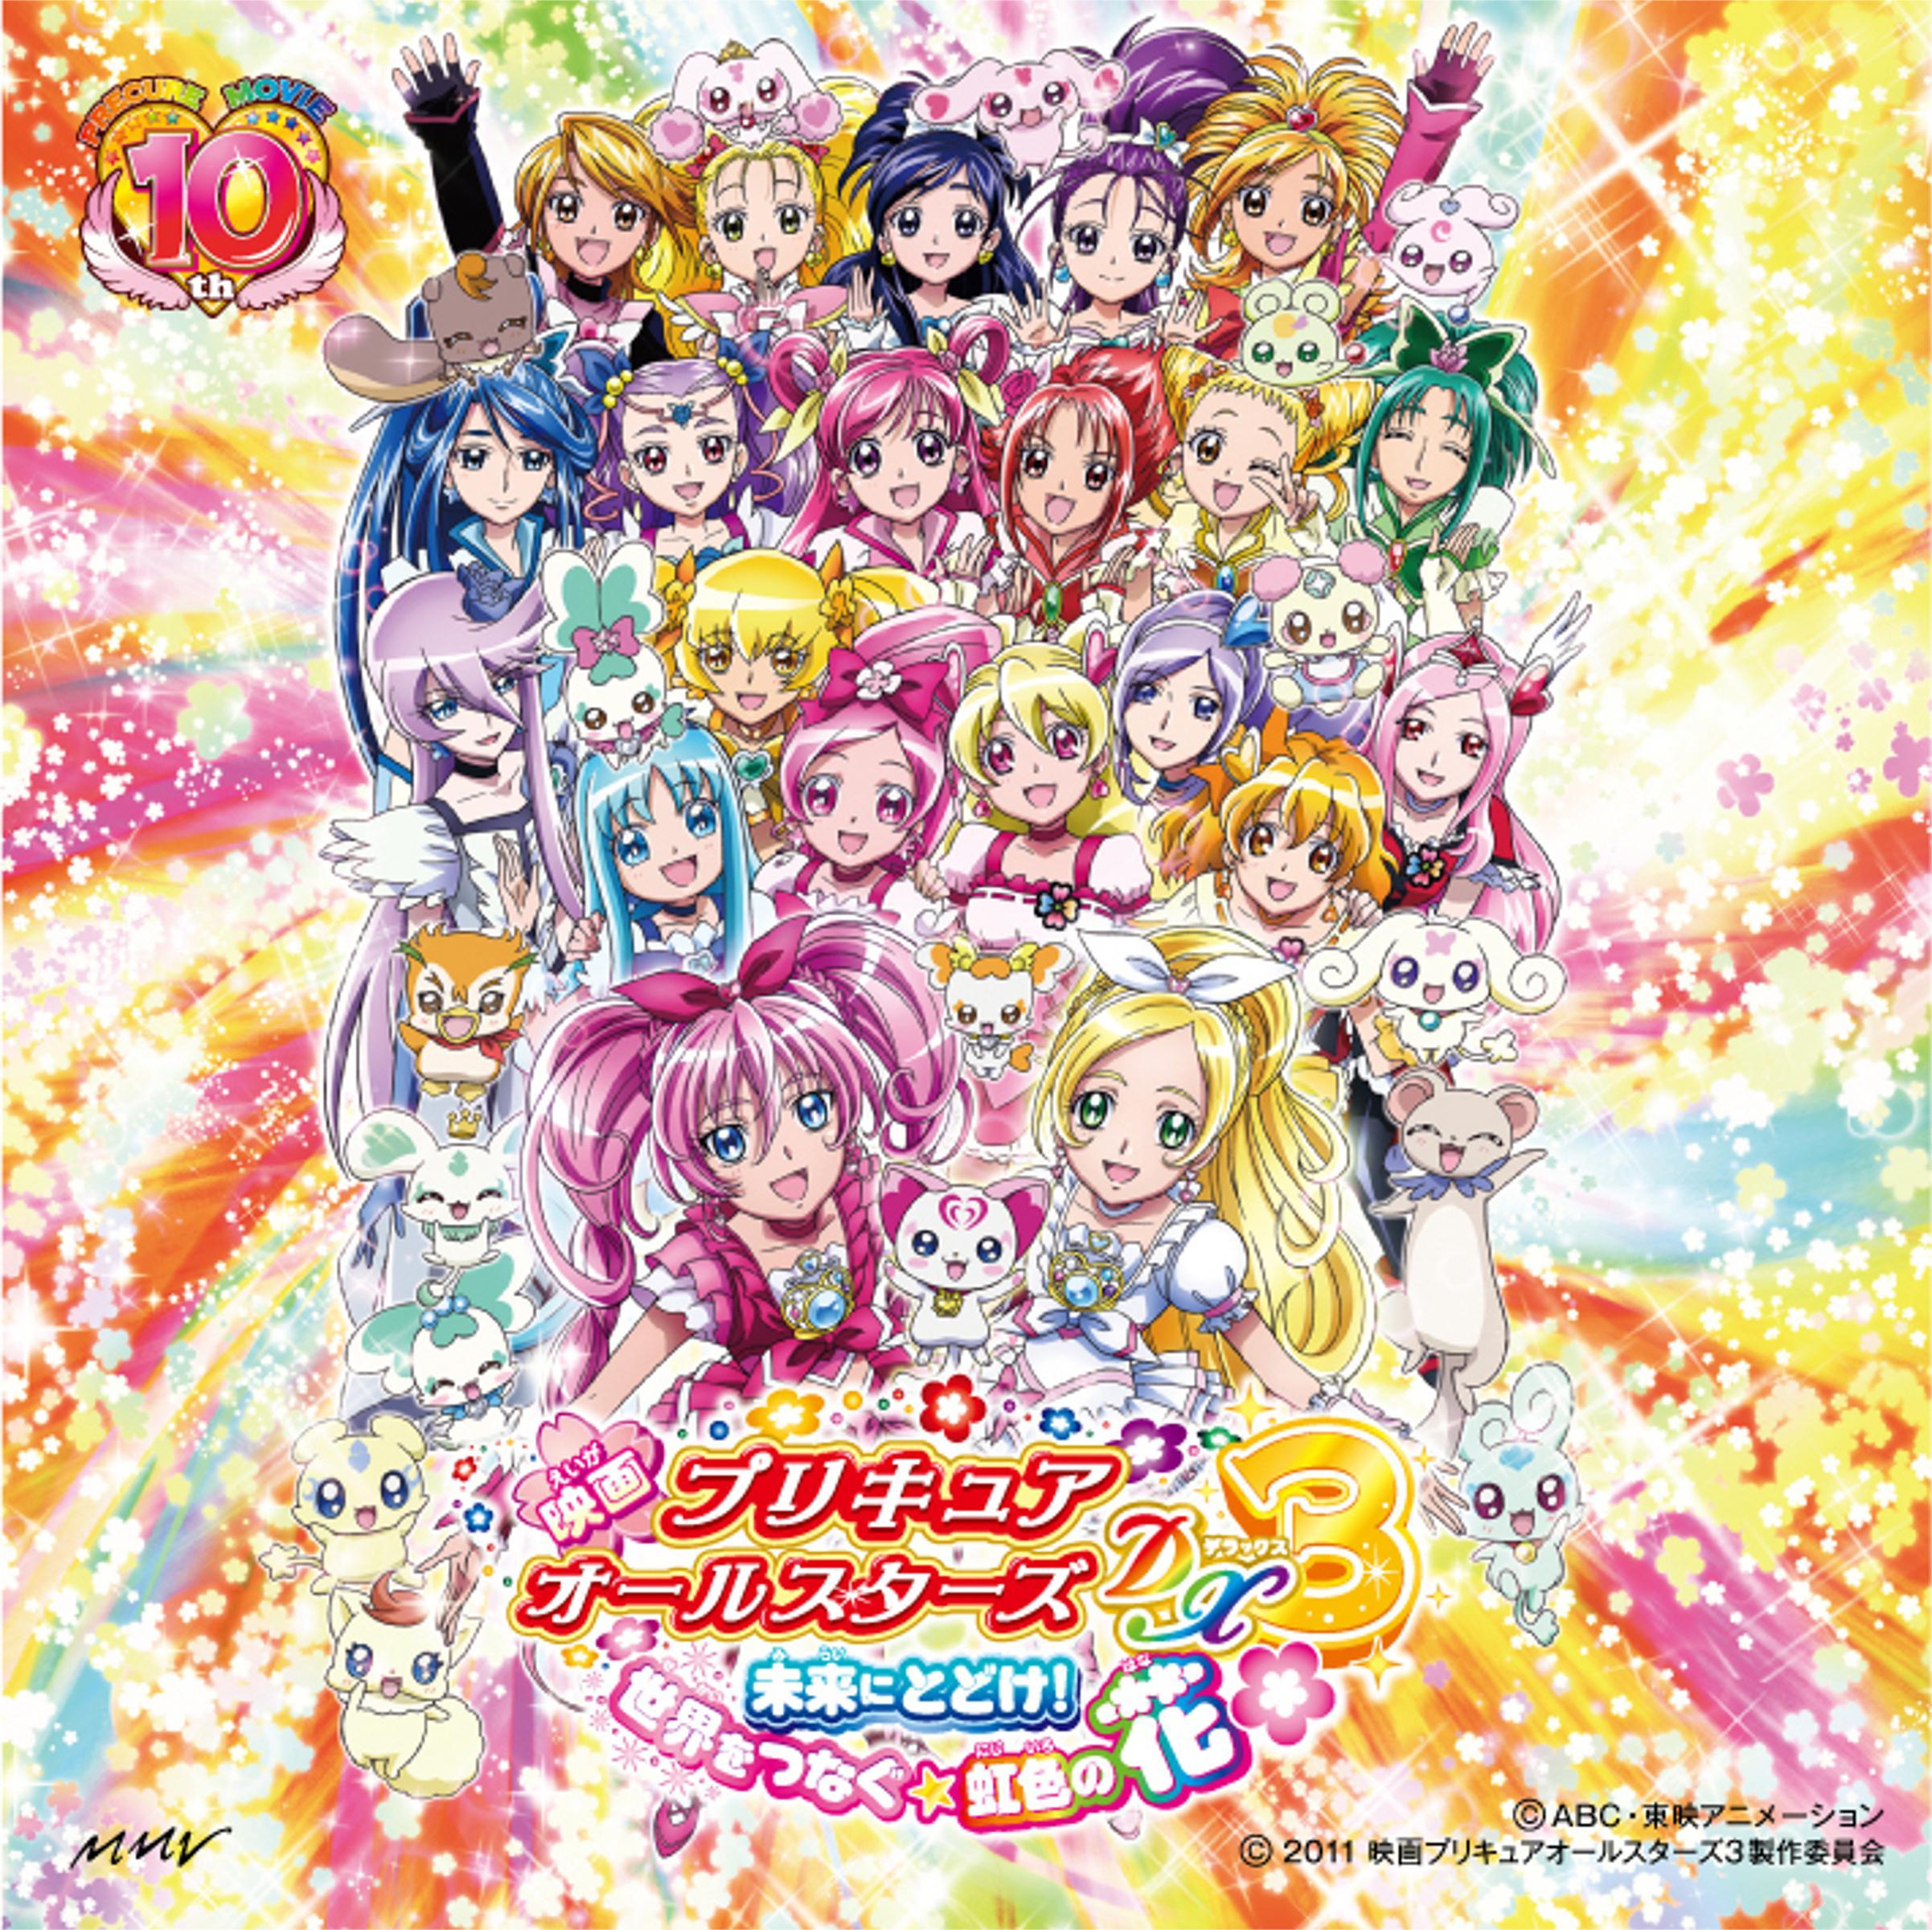 Pretty Cure All Stars DX 3: Mirai ni Todoke! Sekai wo Tsunagu☆Niji-Iro no Hana! Theme Song Single